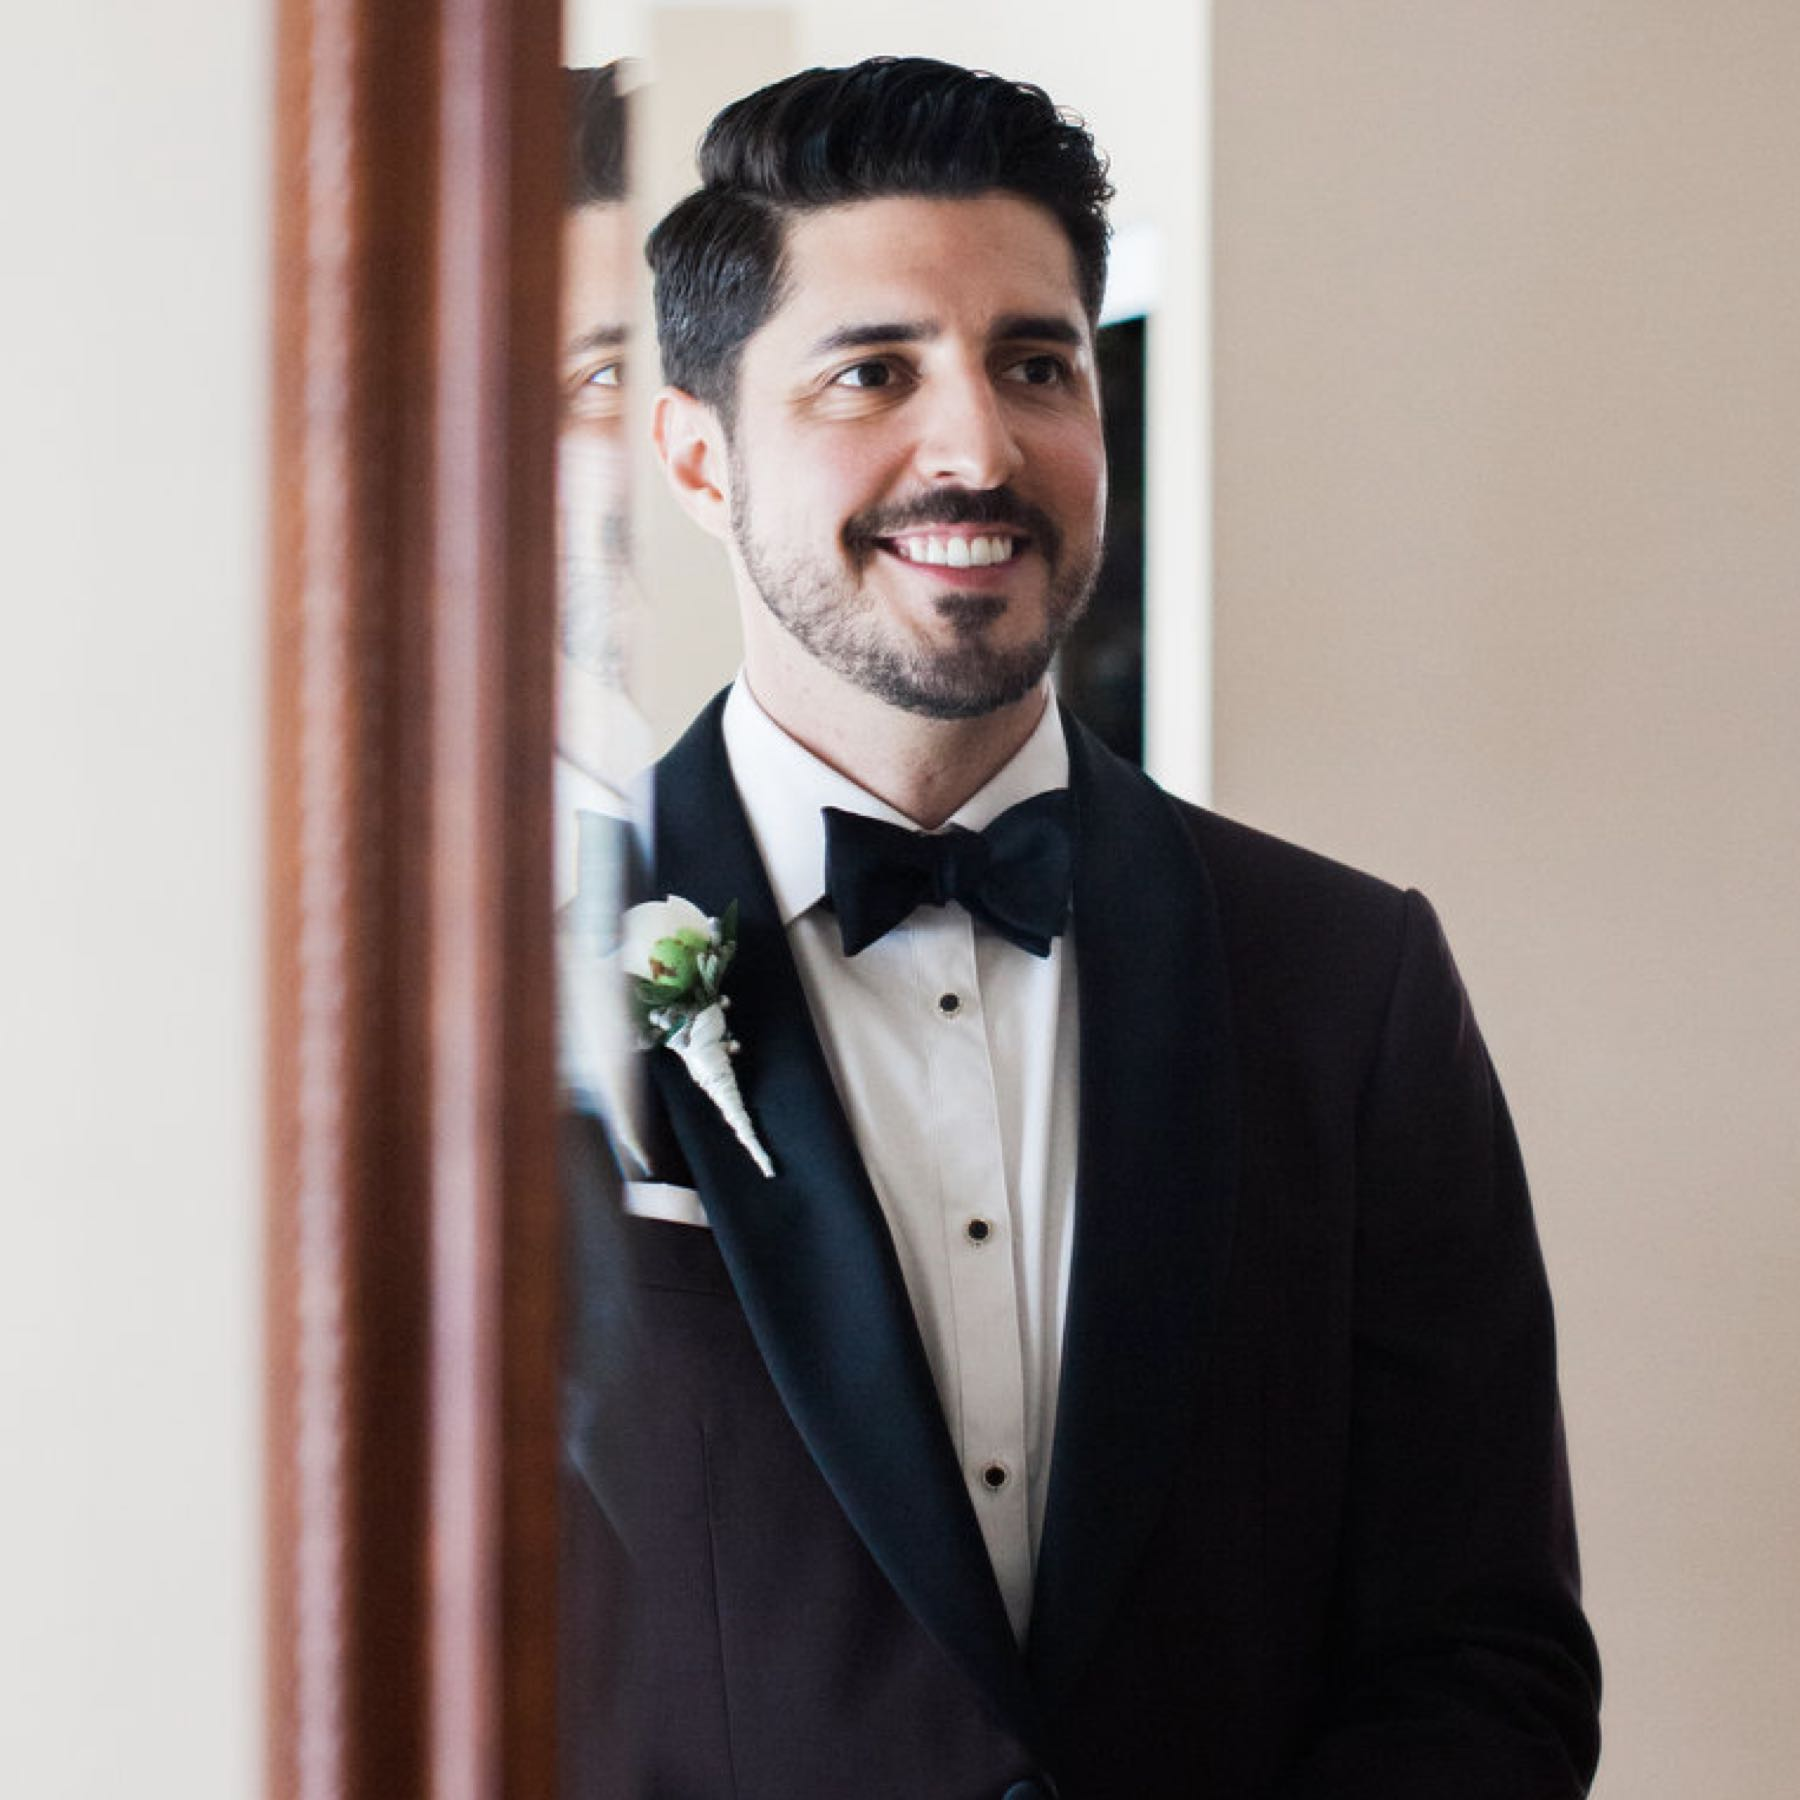 footer-wedding-image-8